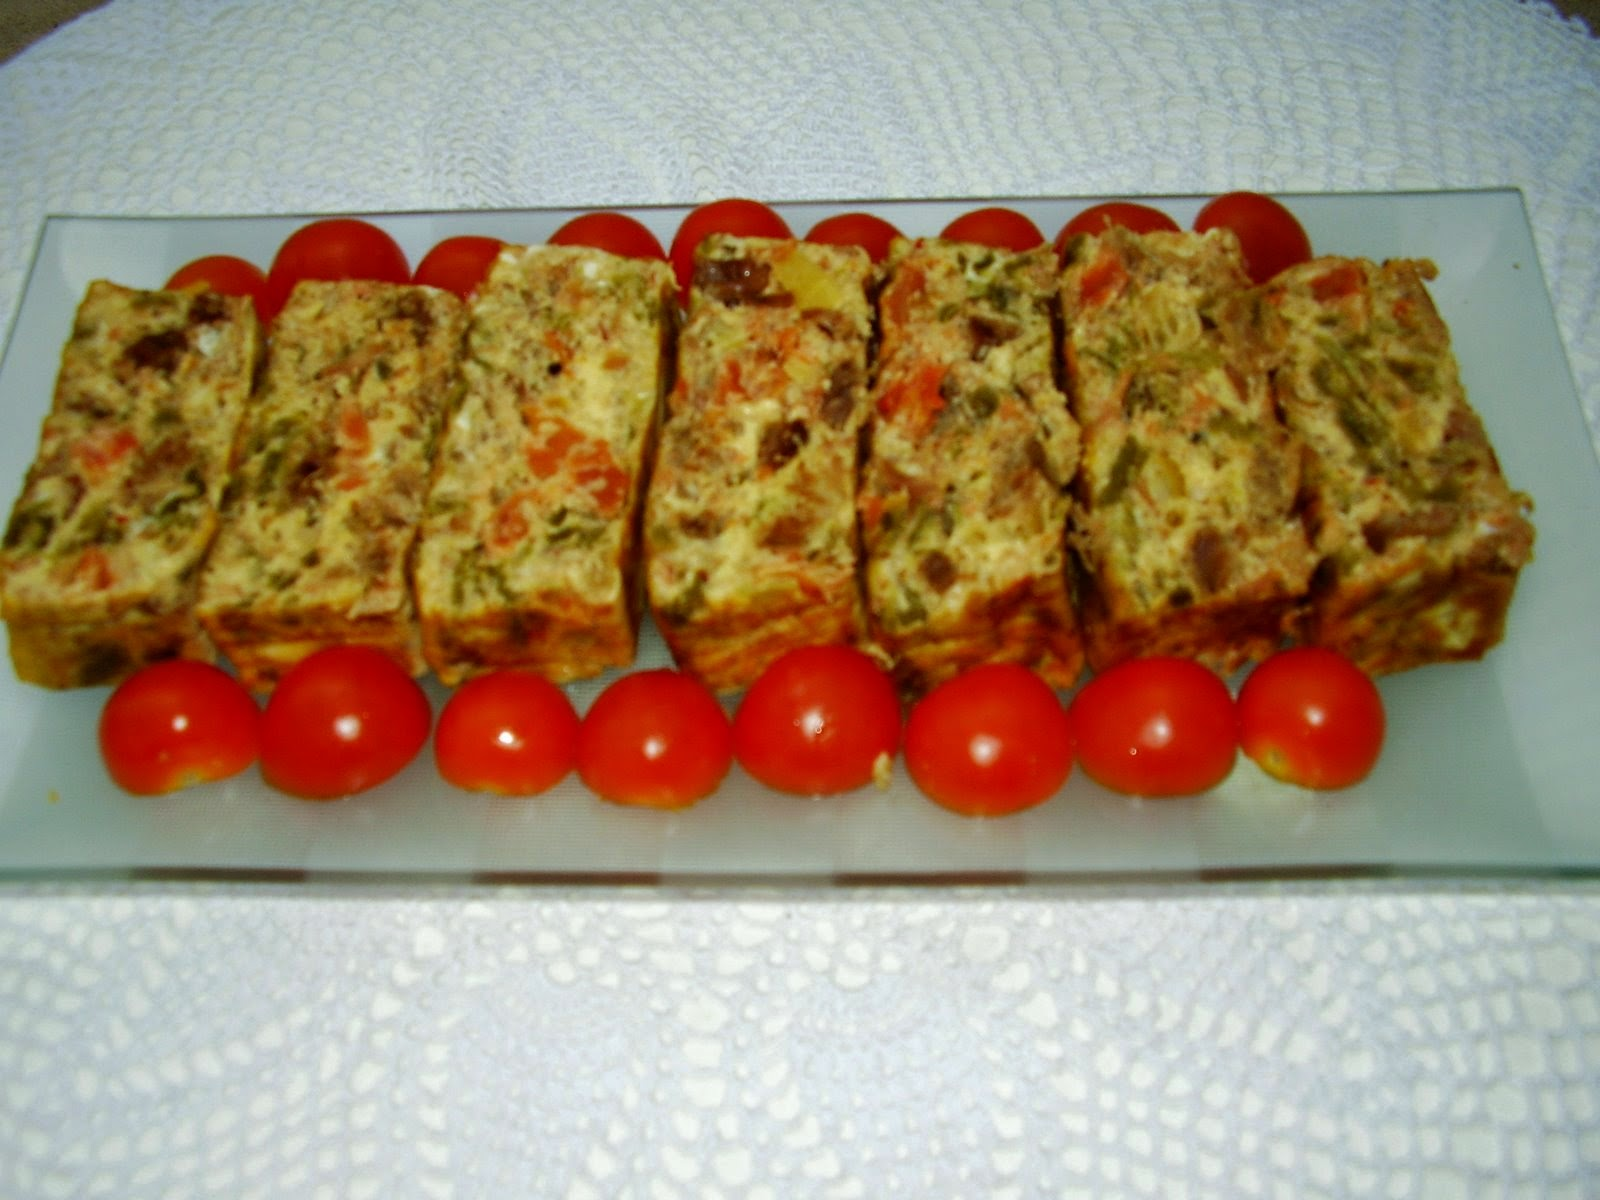 Recette de tajine à la salade méchouiya